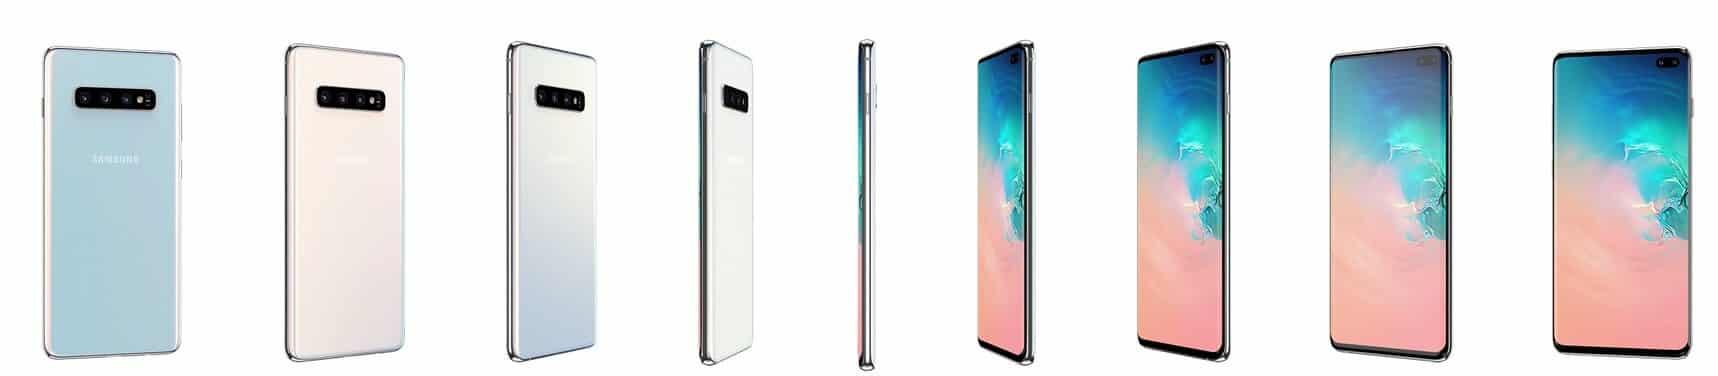 Samsung_Galaxy_S10_Plus